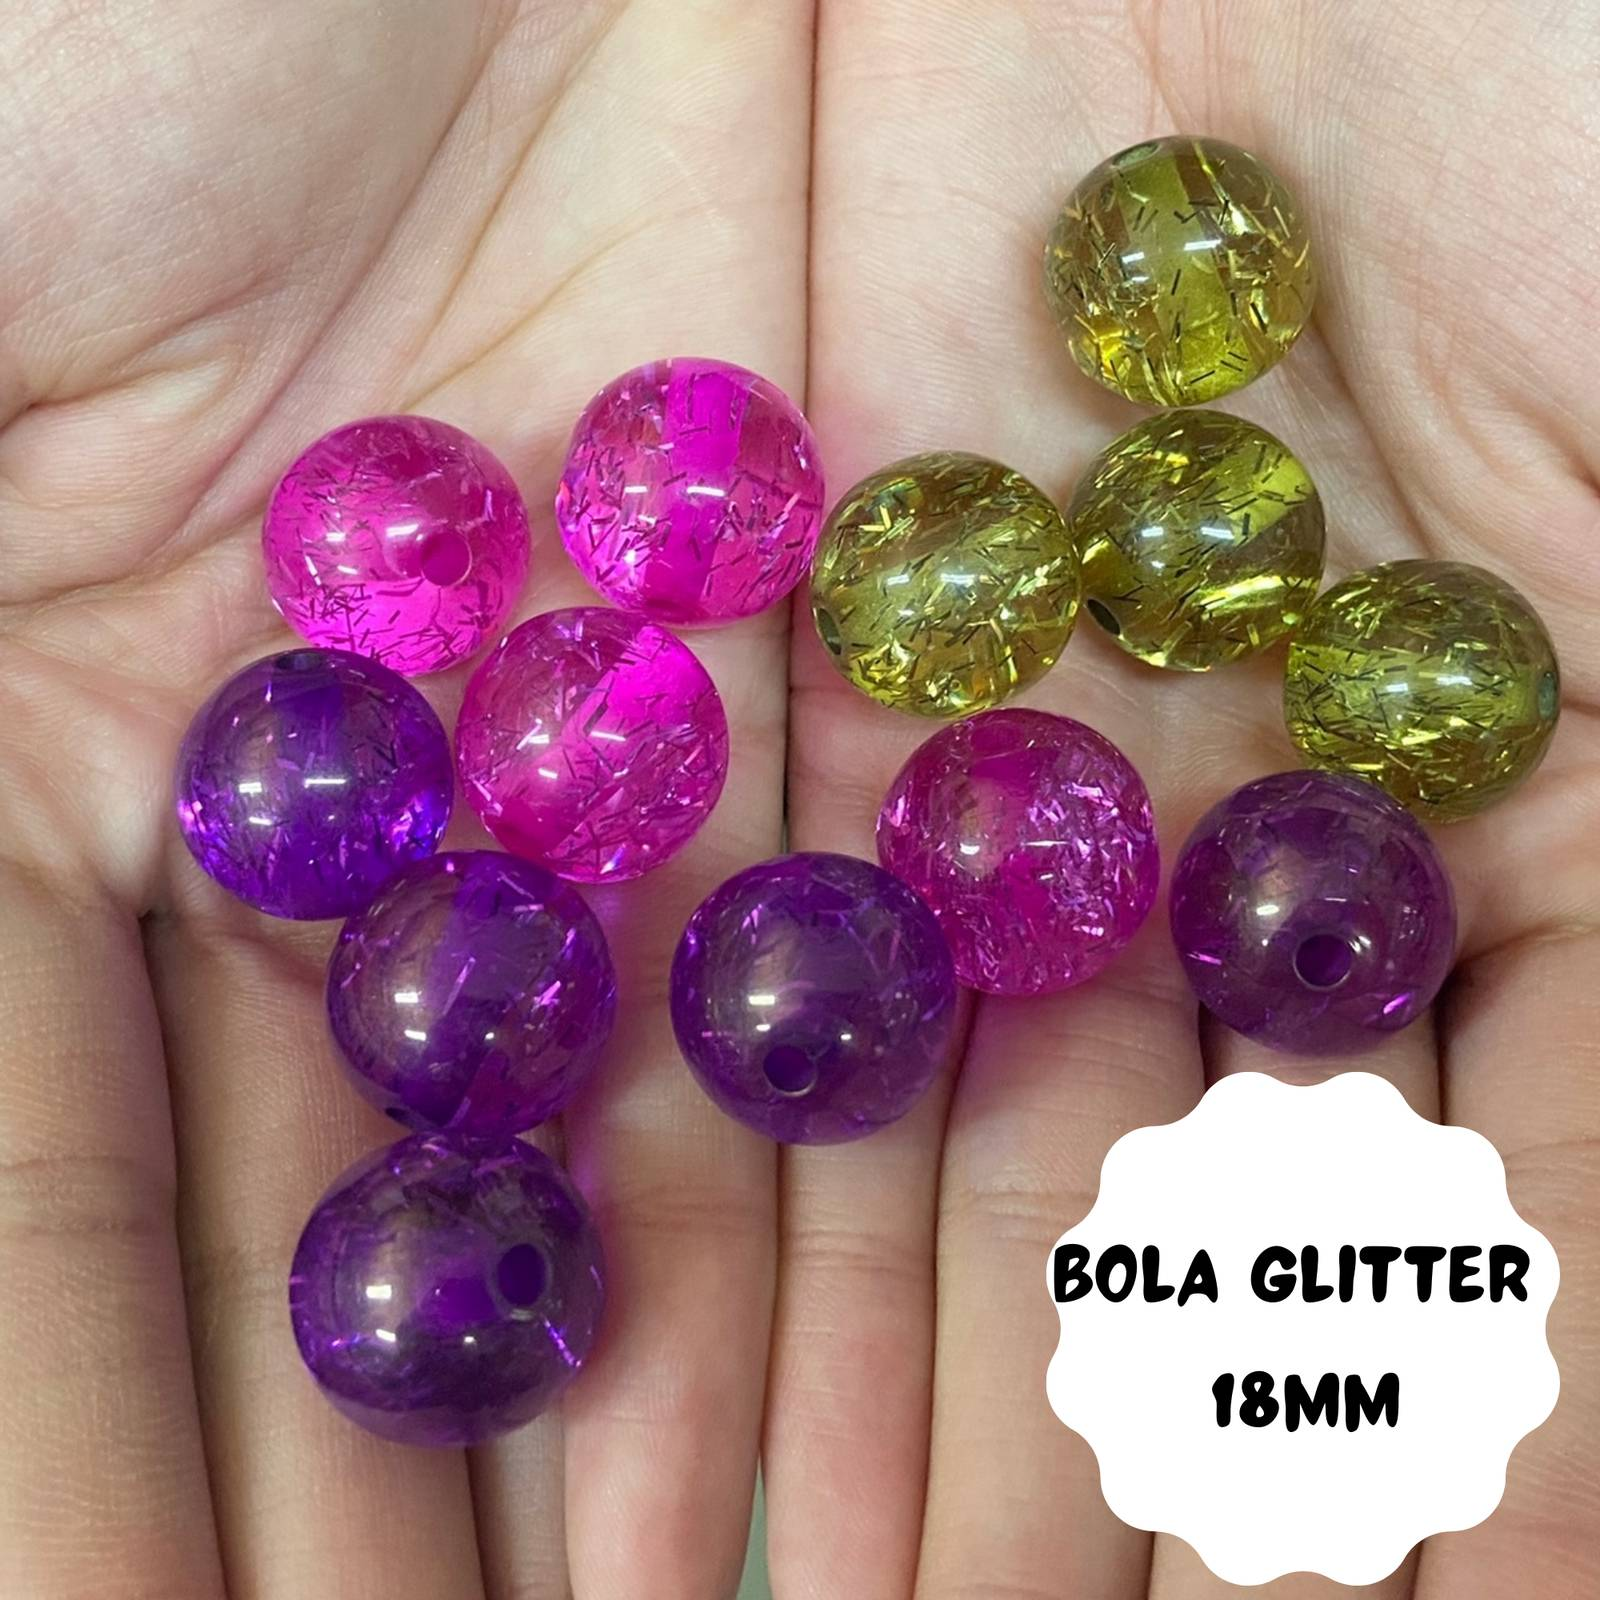 Bola Glitter 18mm - 500g